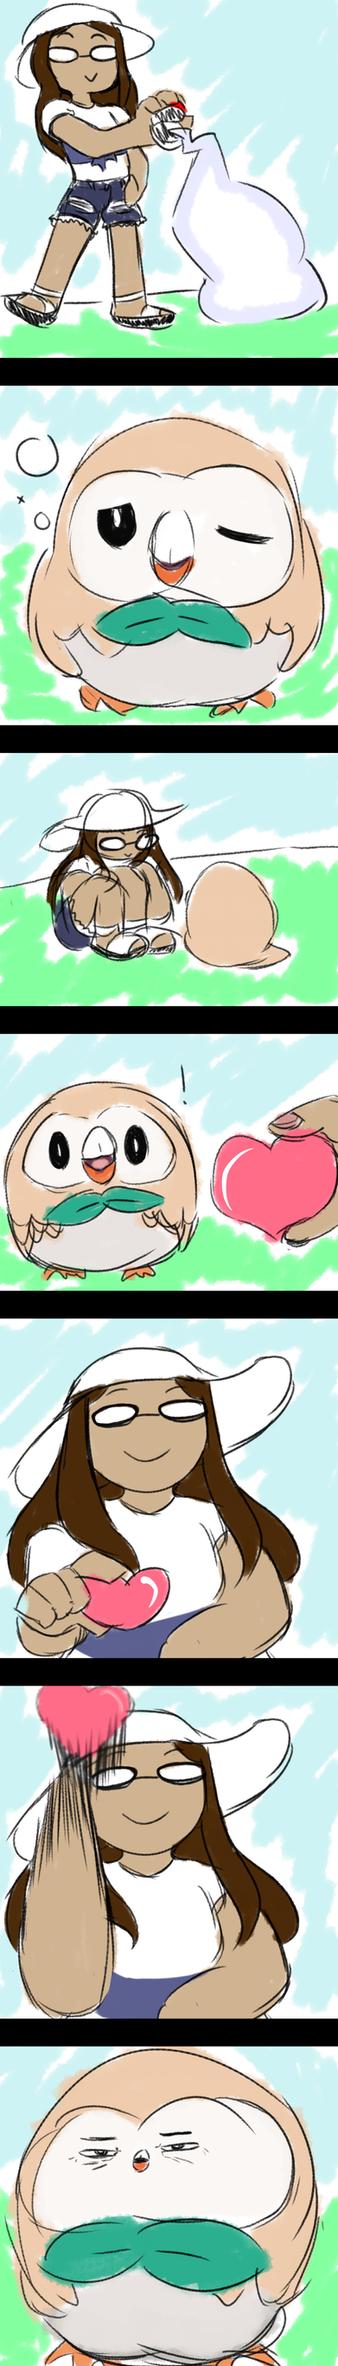 Pokefresh Beans Comic by RainstormArt